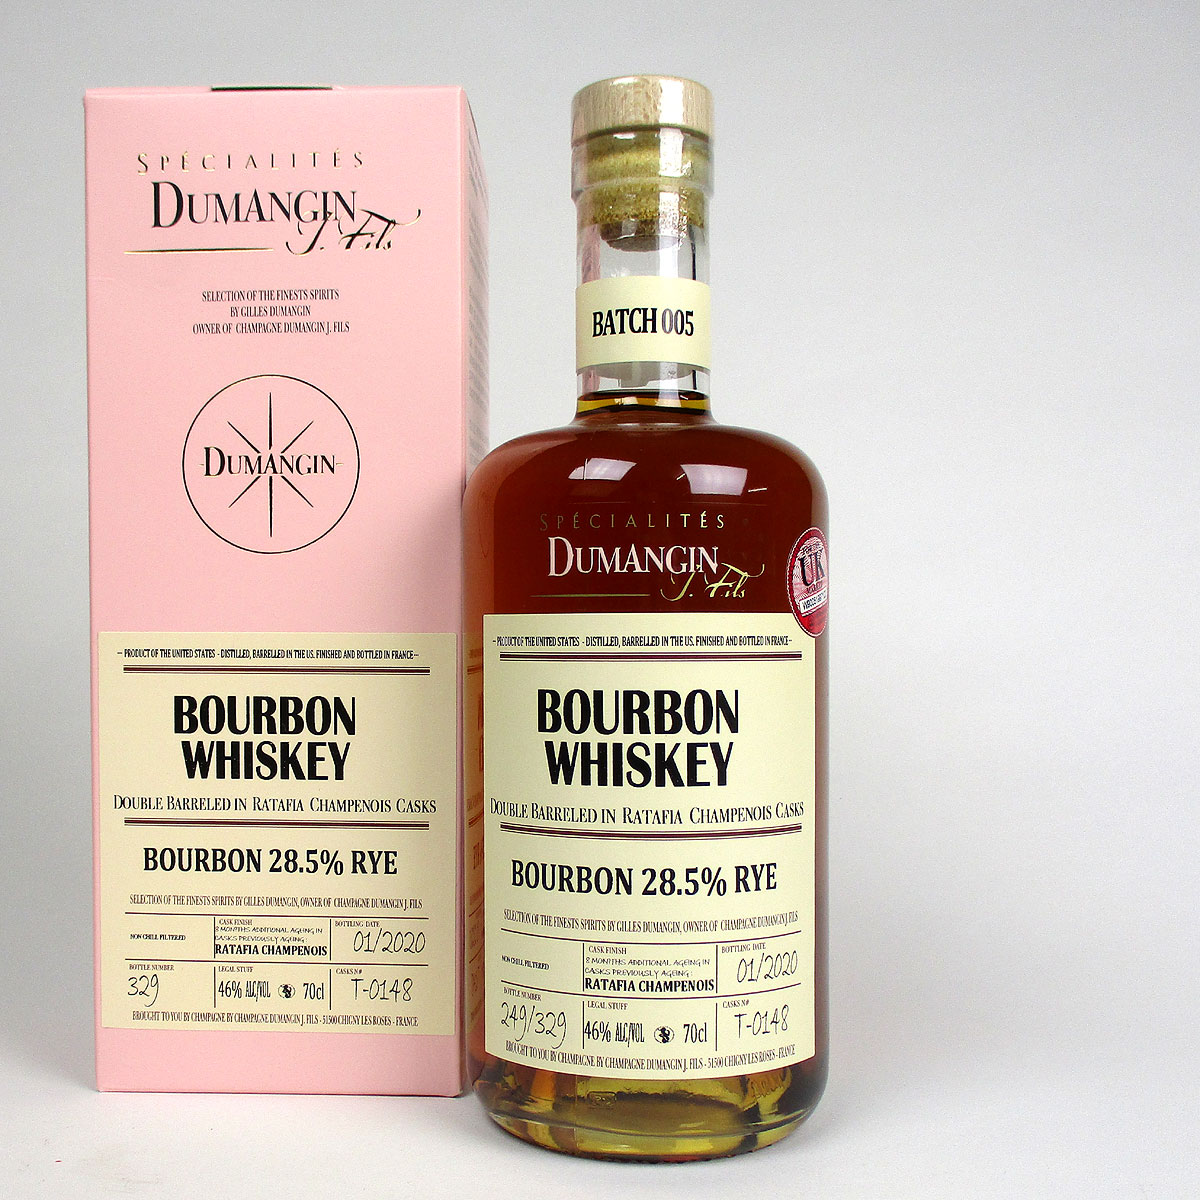 Rye Bourbon Whiskey: Spécialités Dumangin